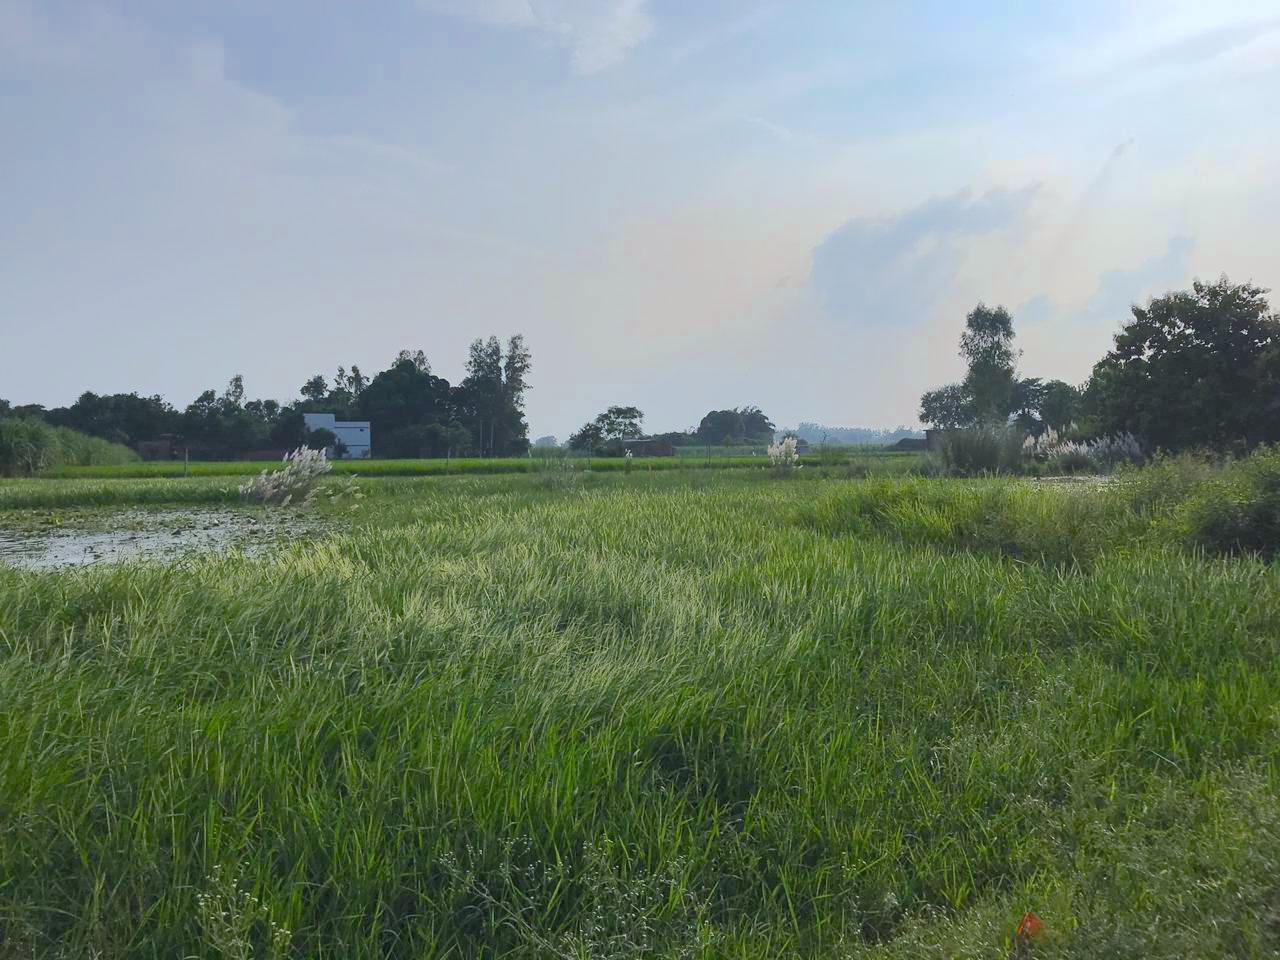 Paddy field in Ambedkar Nagar, UP